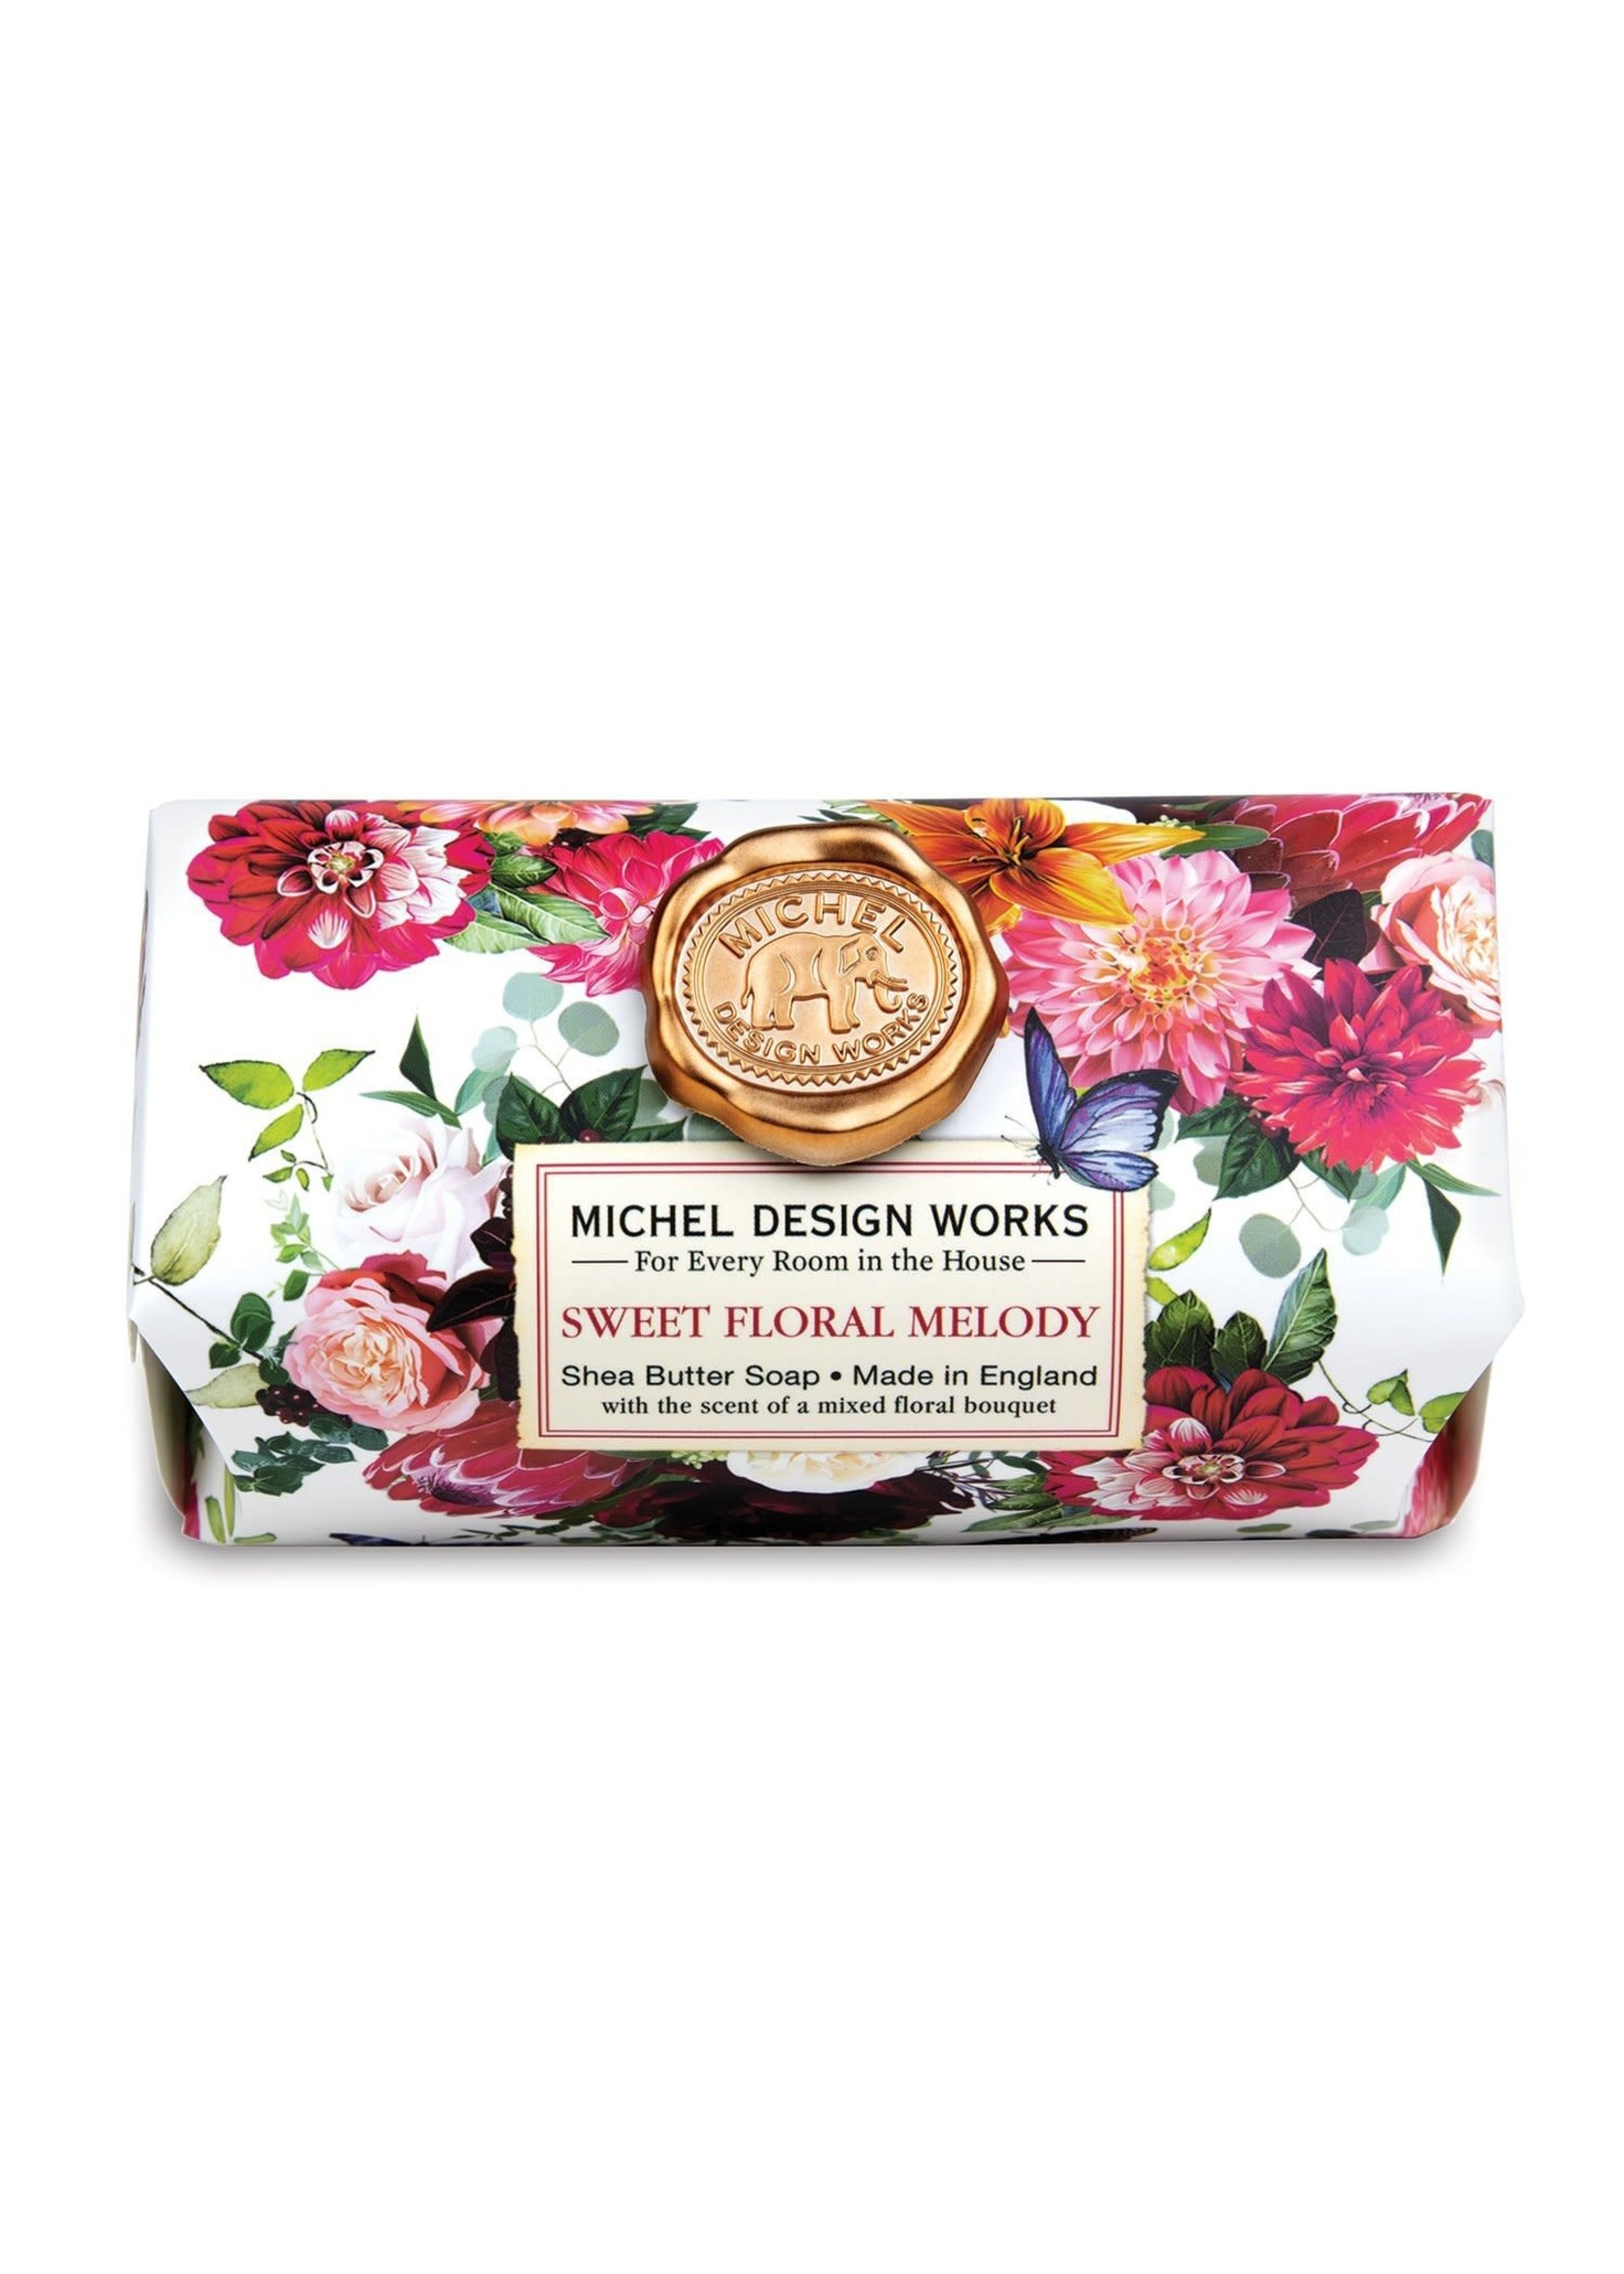 SWEET FLORAL MELODY LARGE BATH SOAP BAR